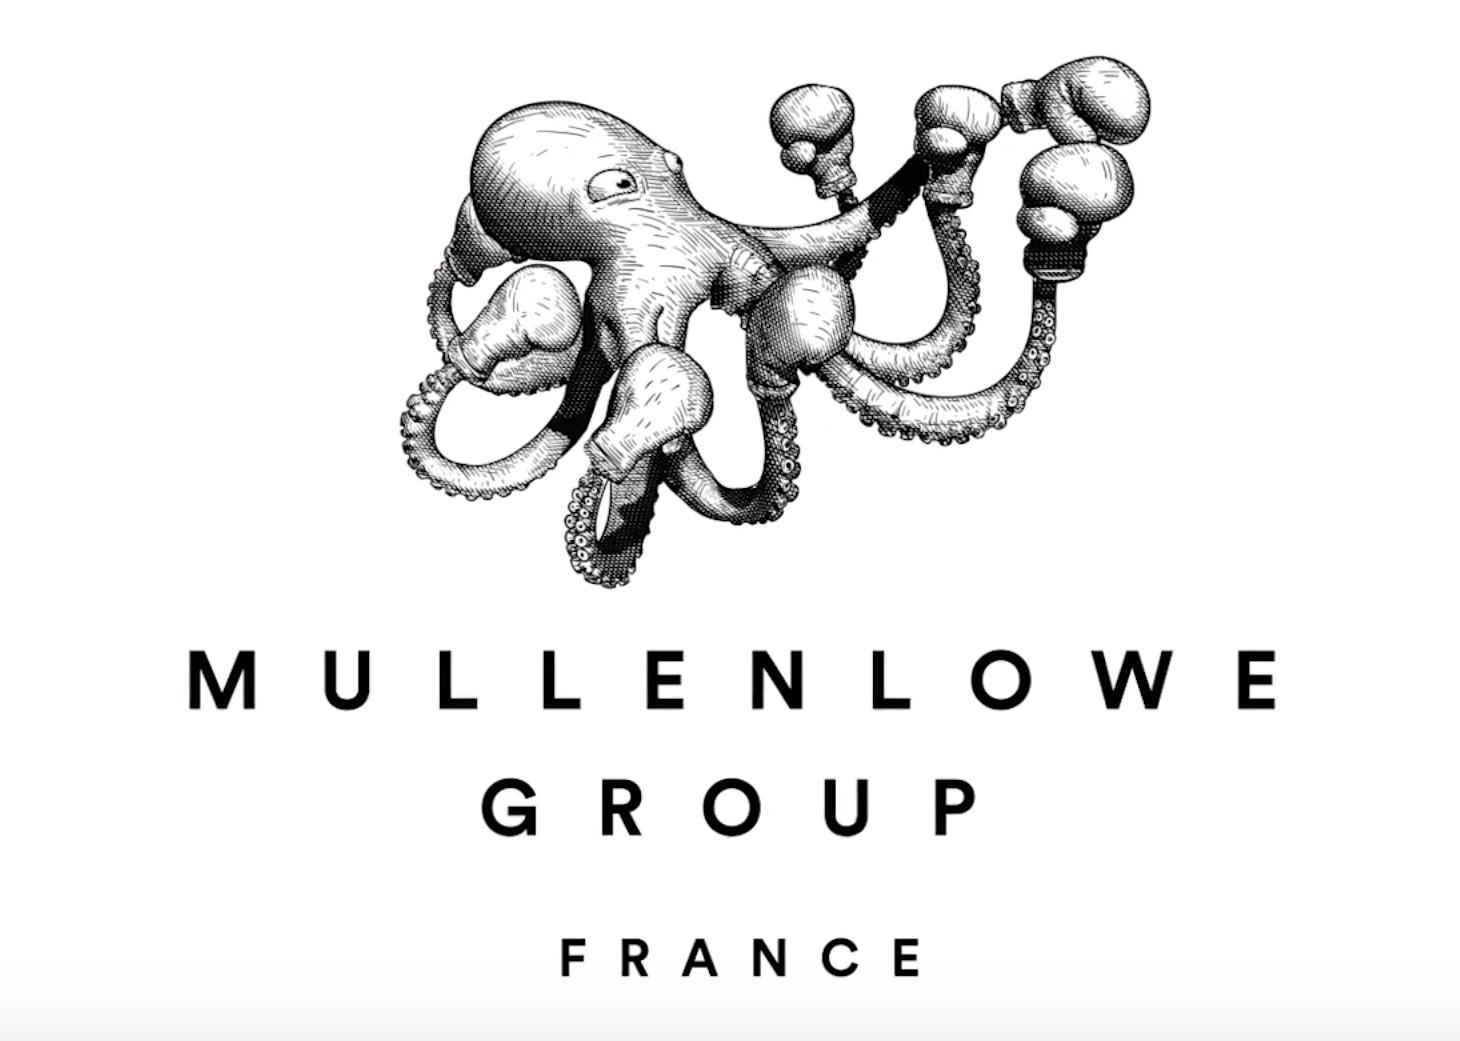 logo-mullenlowe-group-france-2016